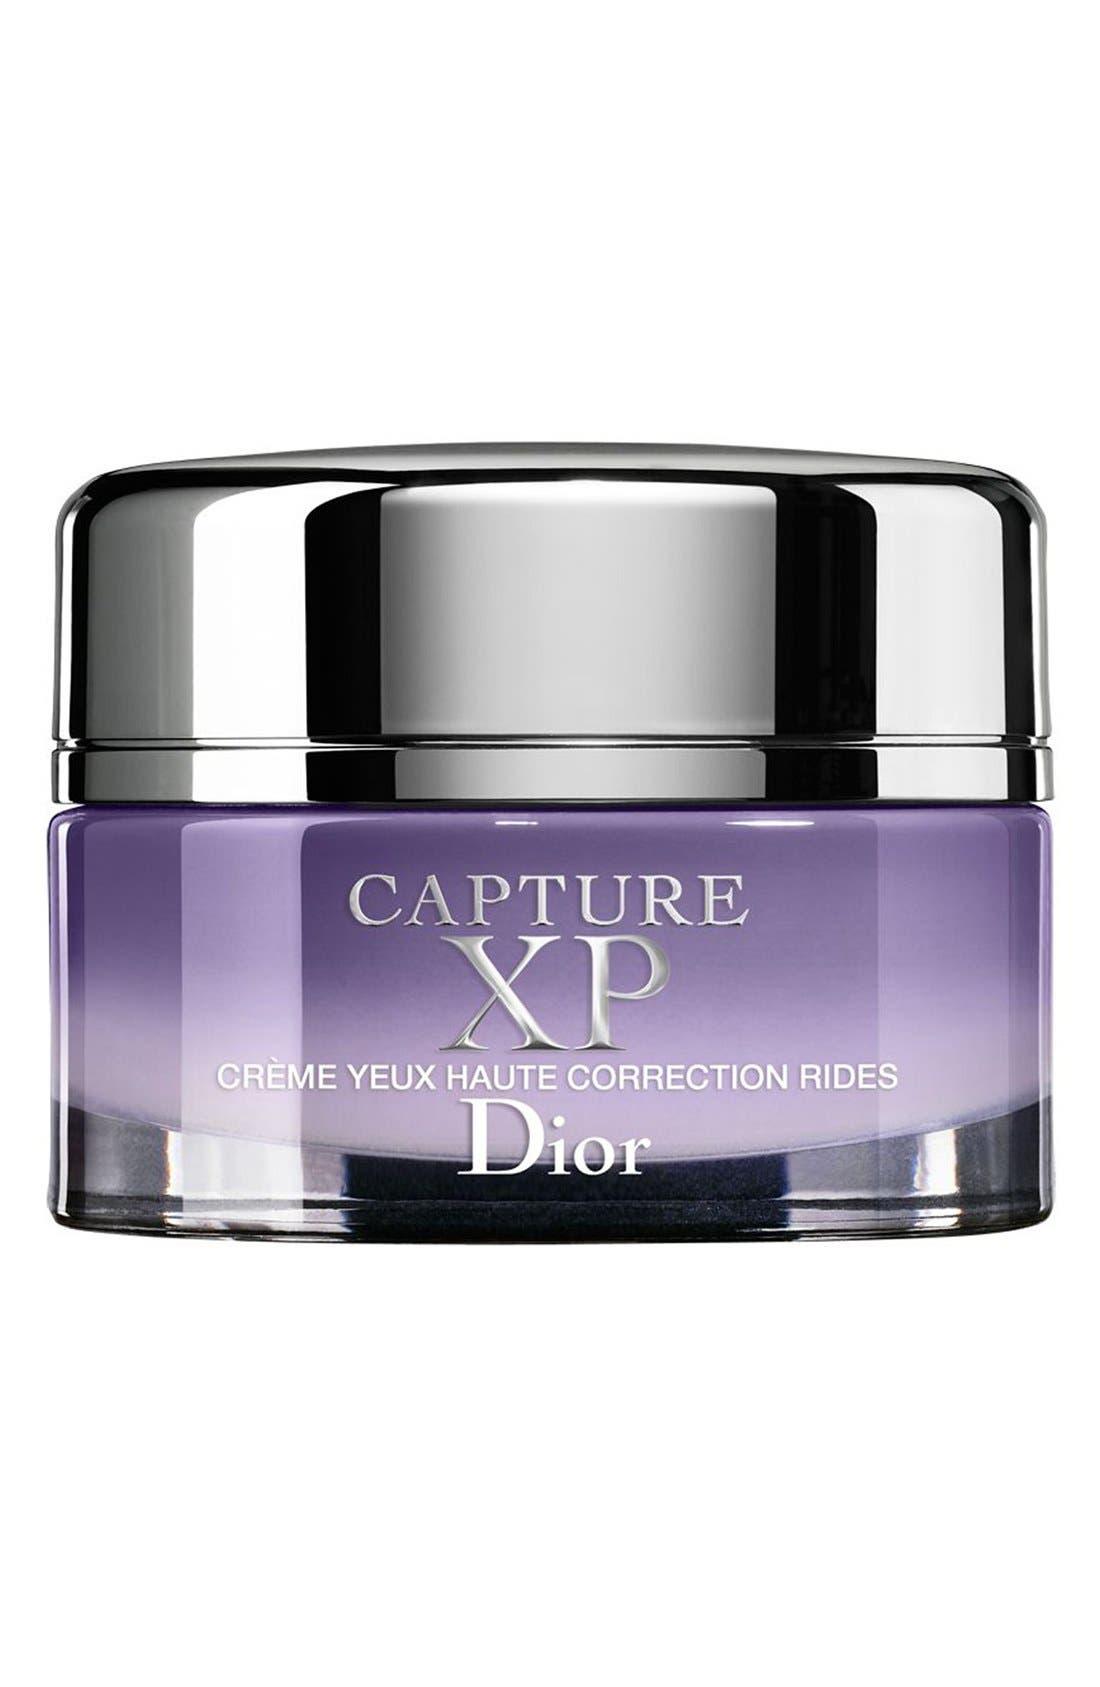 Dior 'Capture XP Ultimate' Wrinkle Correction Eye Crème